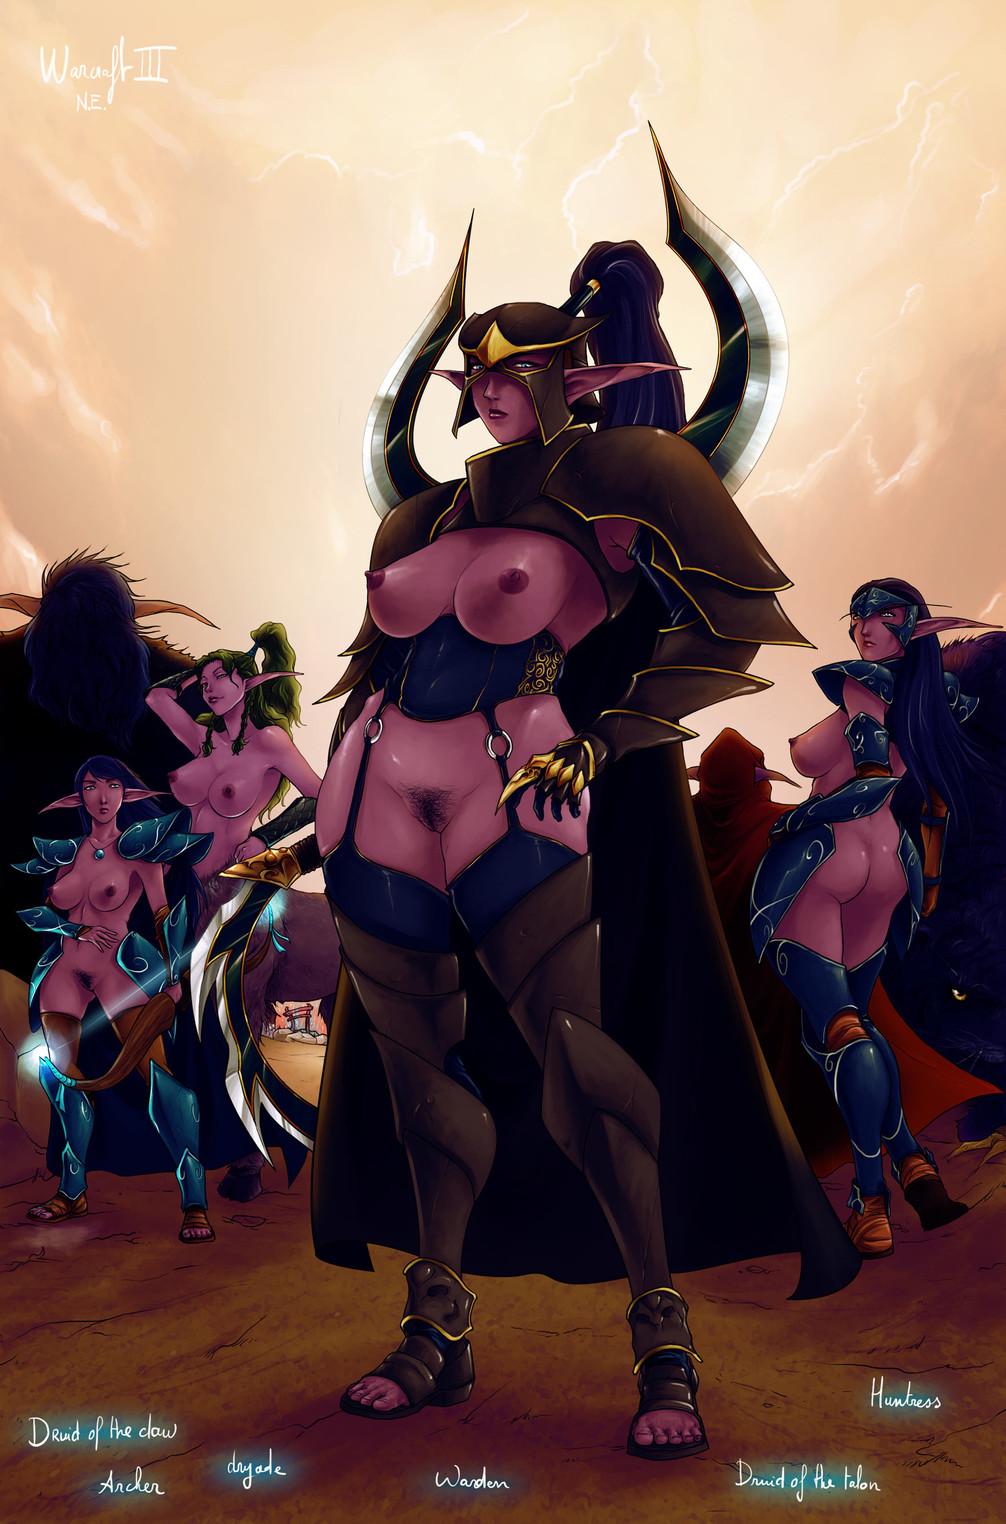 world of warcraft porn femboy One piece film gold carina